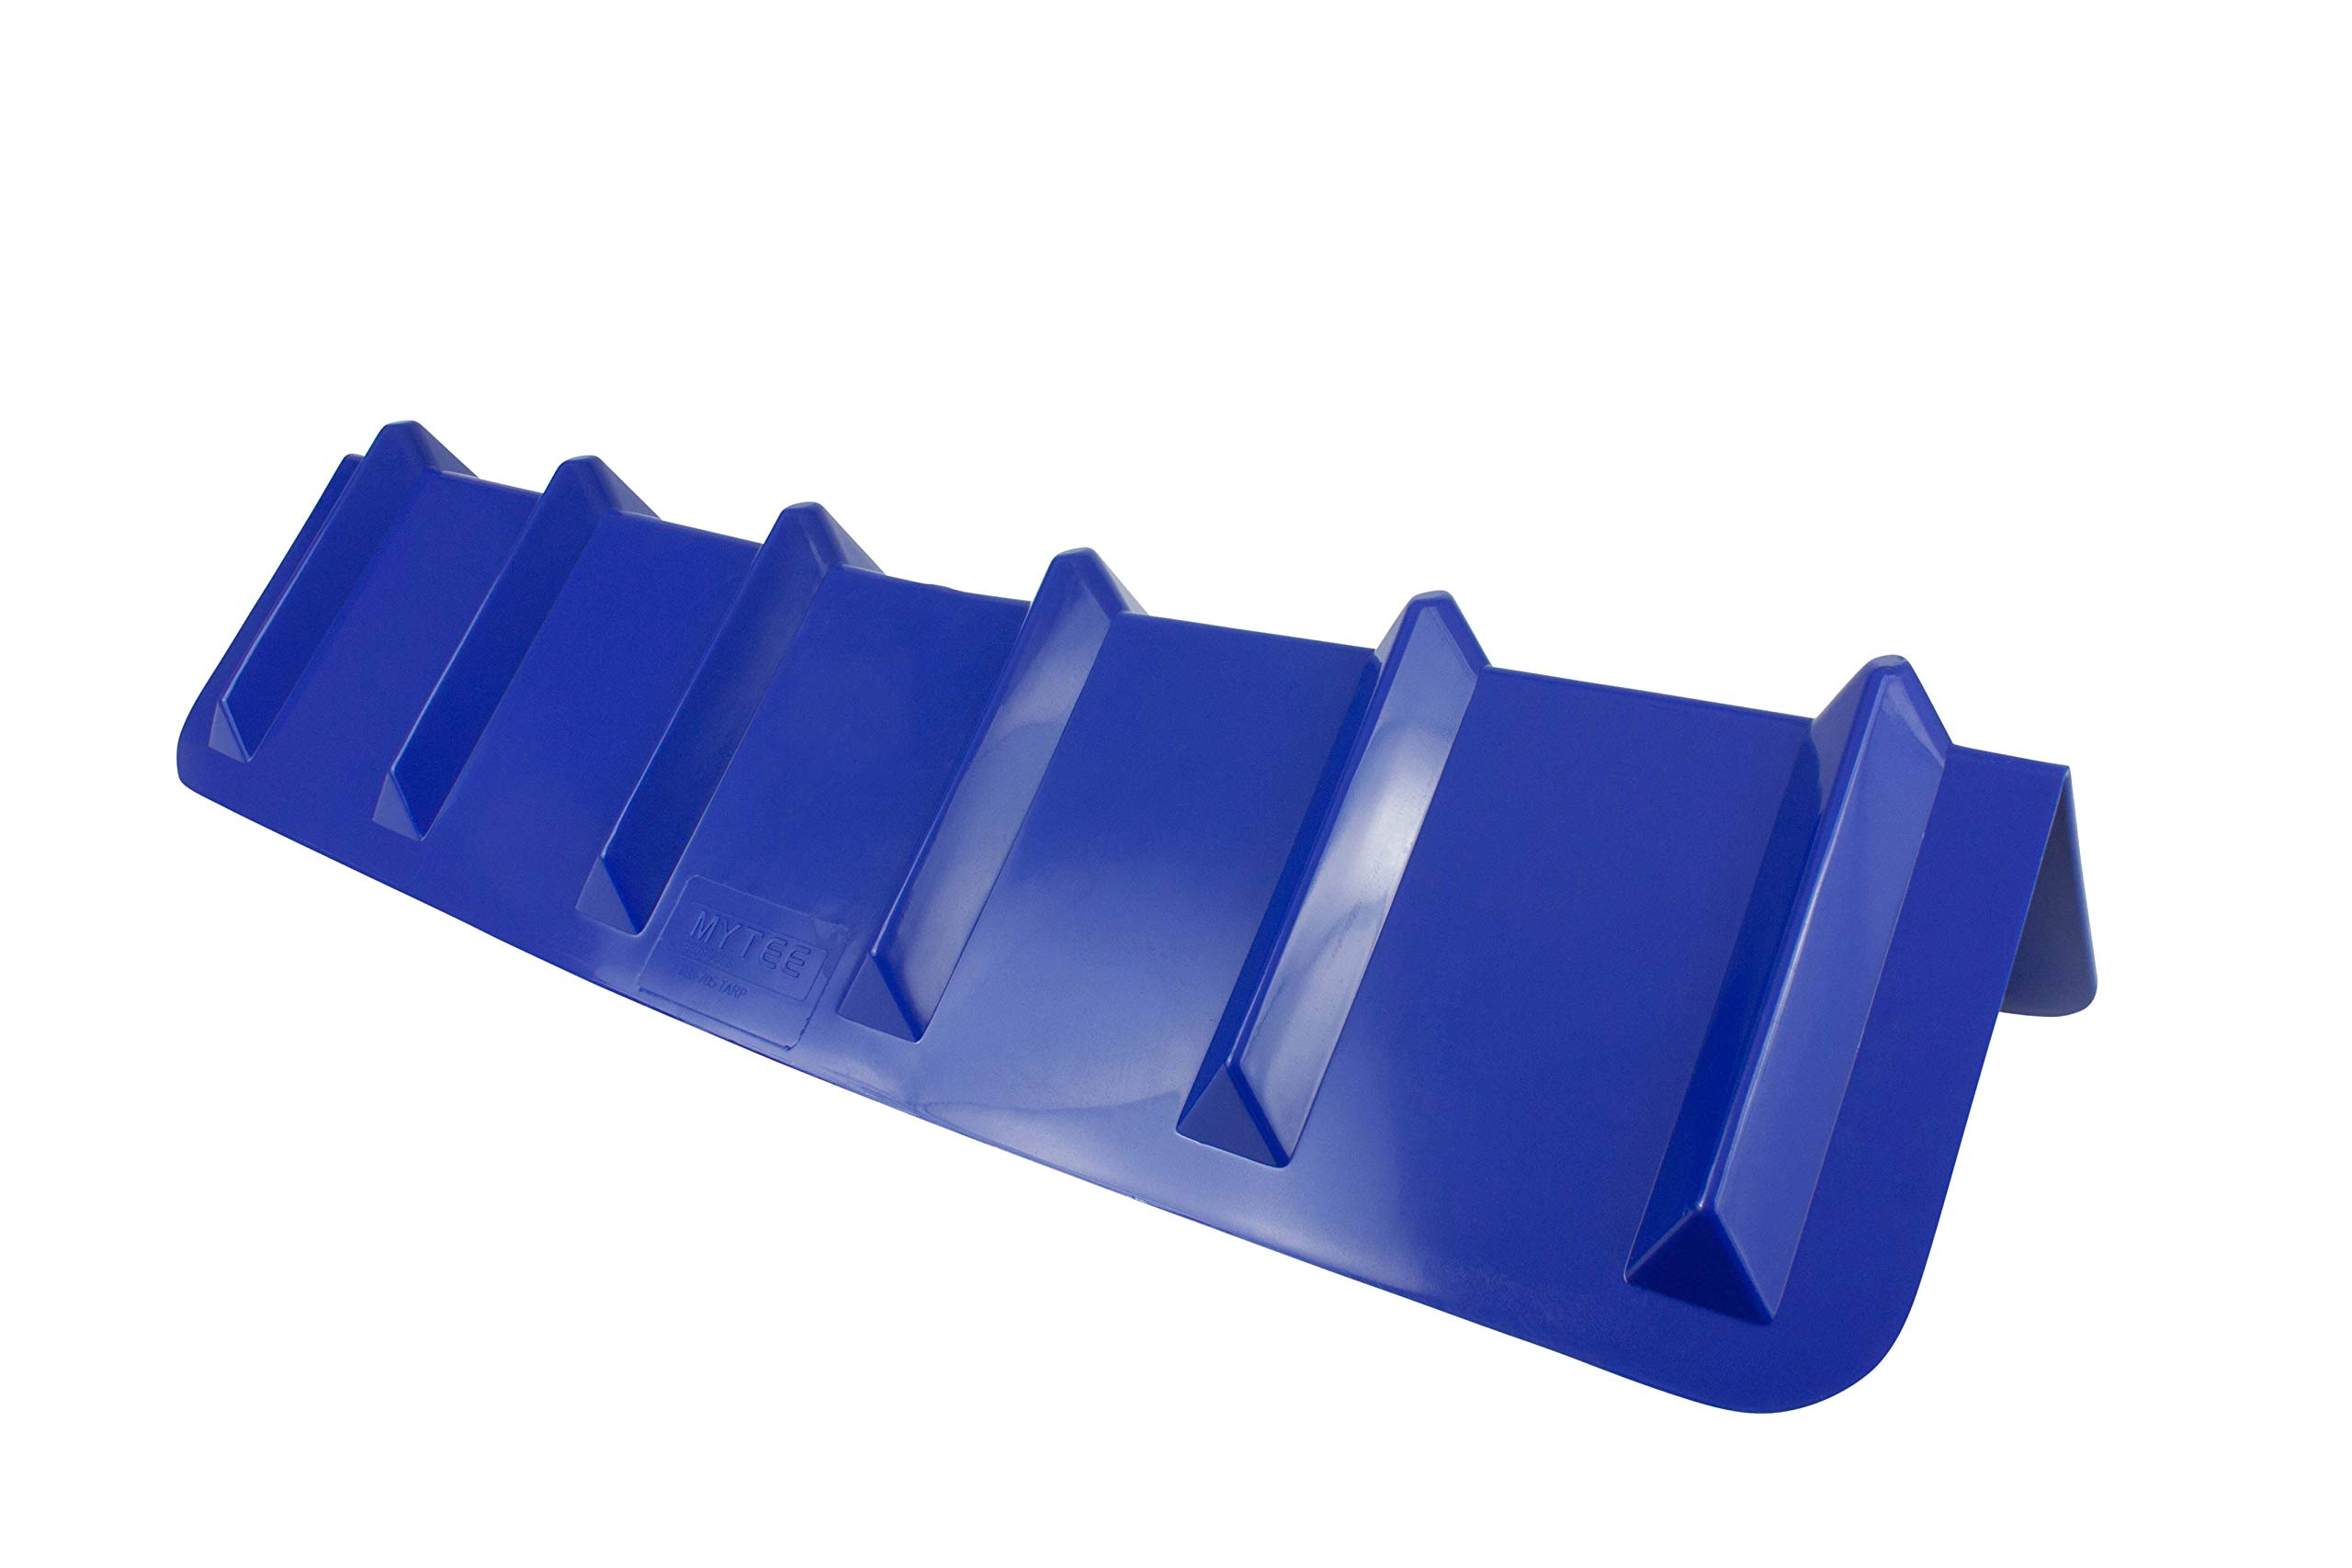 Blue Corner Protector Vee Shaped/V Edge Guard - 8'' x 8'' x 36'' Inches